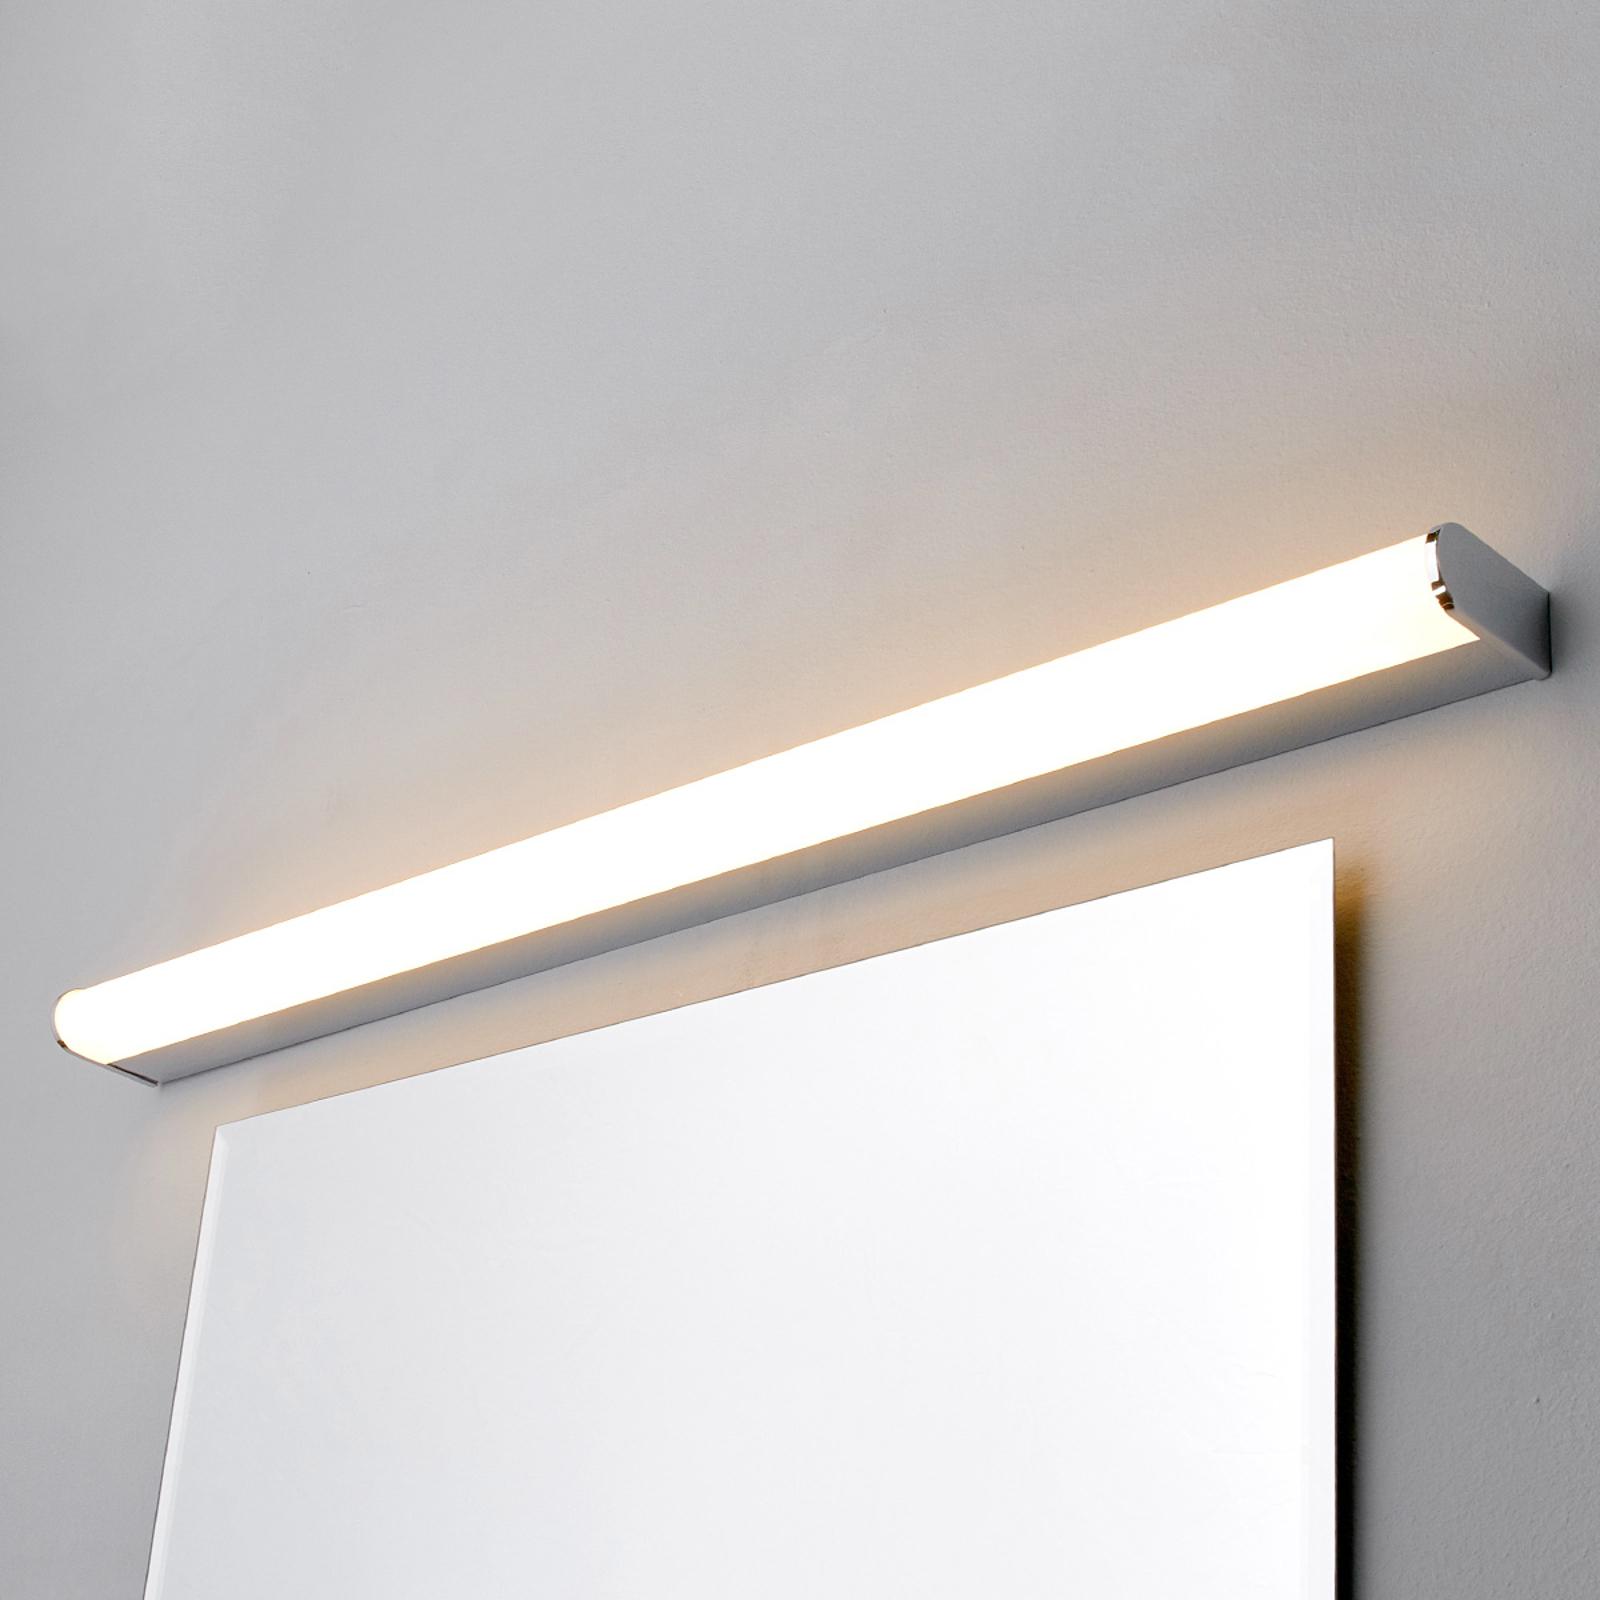 Applique miroir bain LED Philippa demi-ronde 88cm